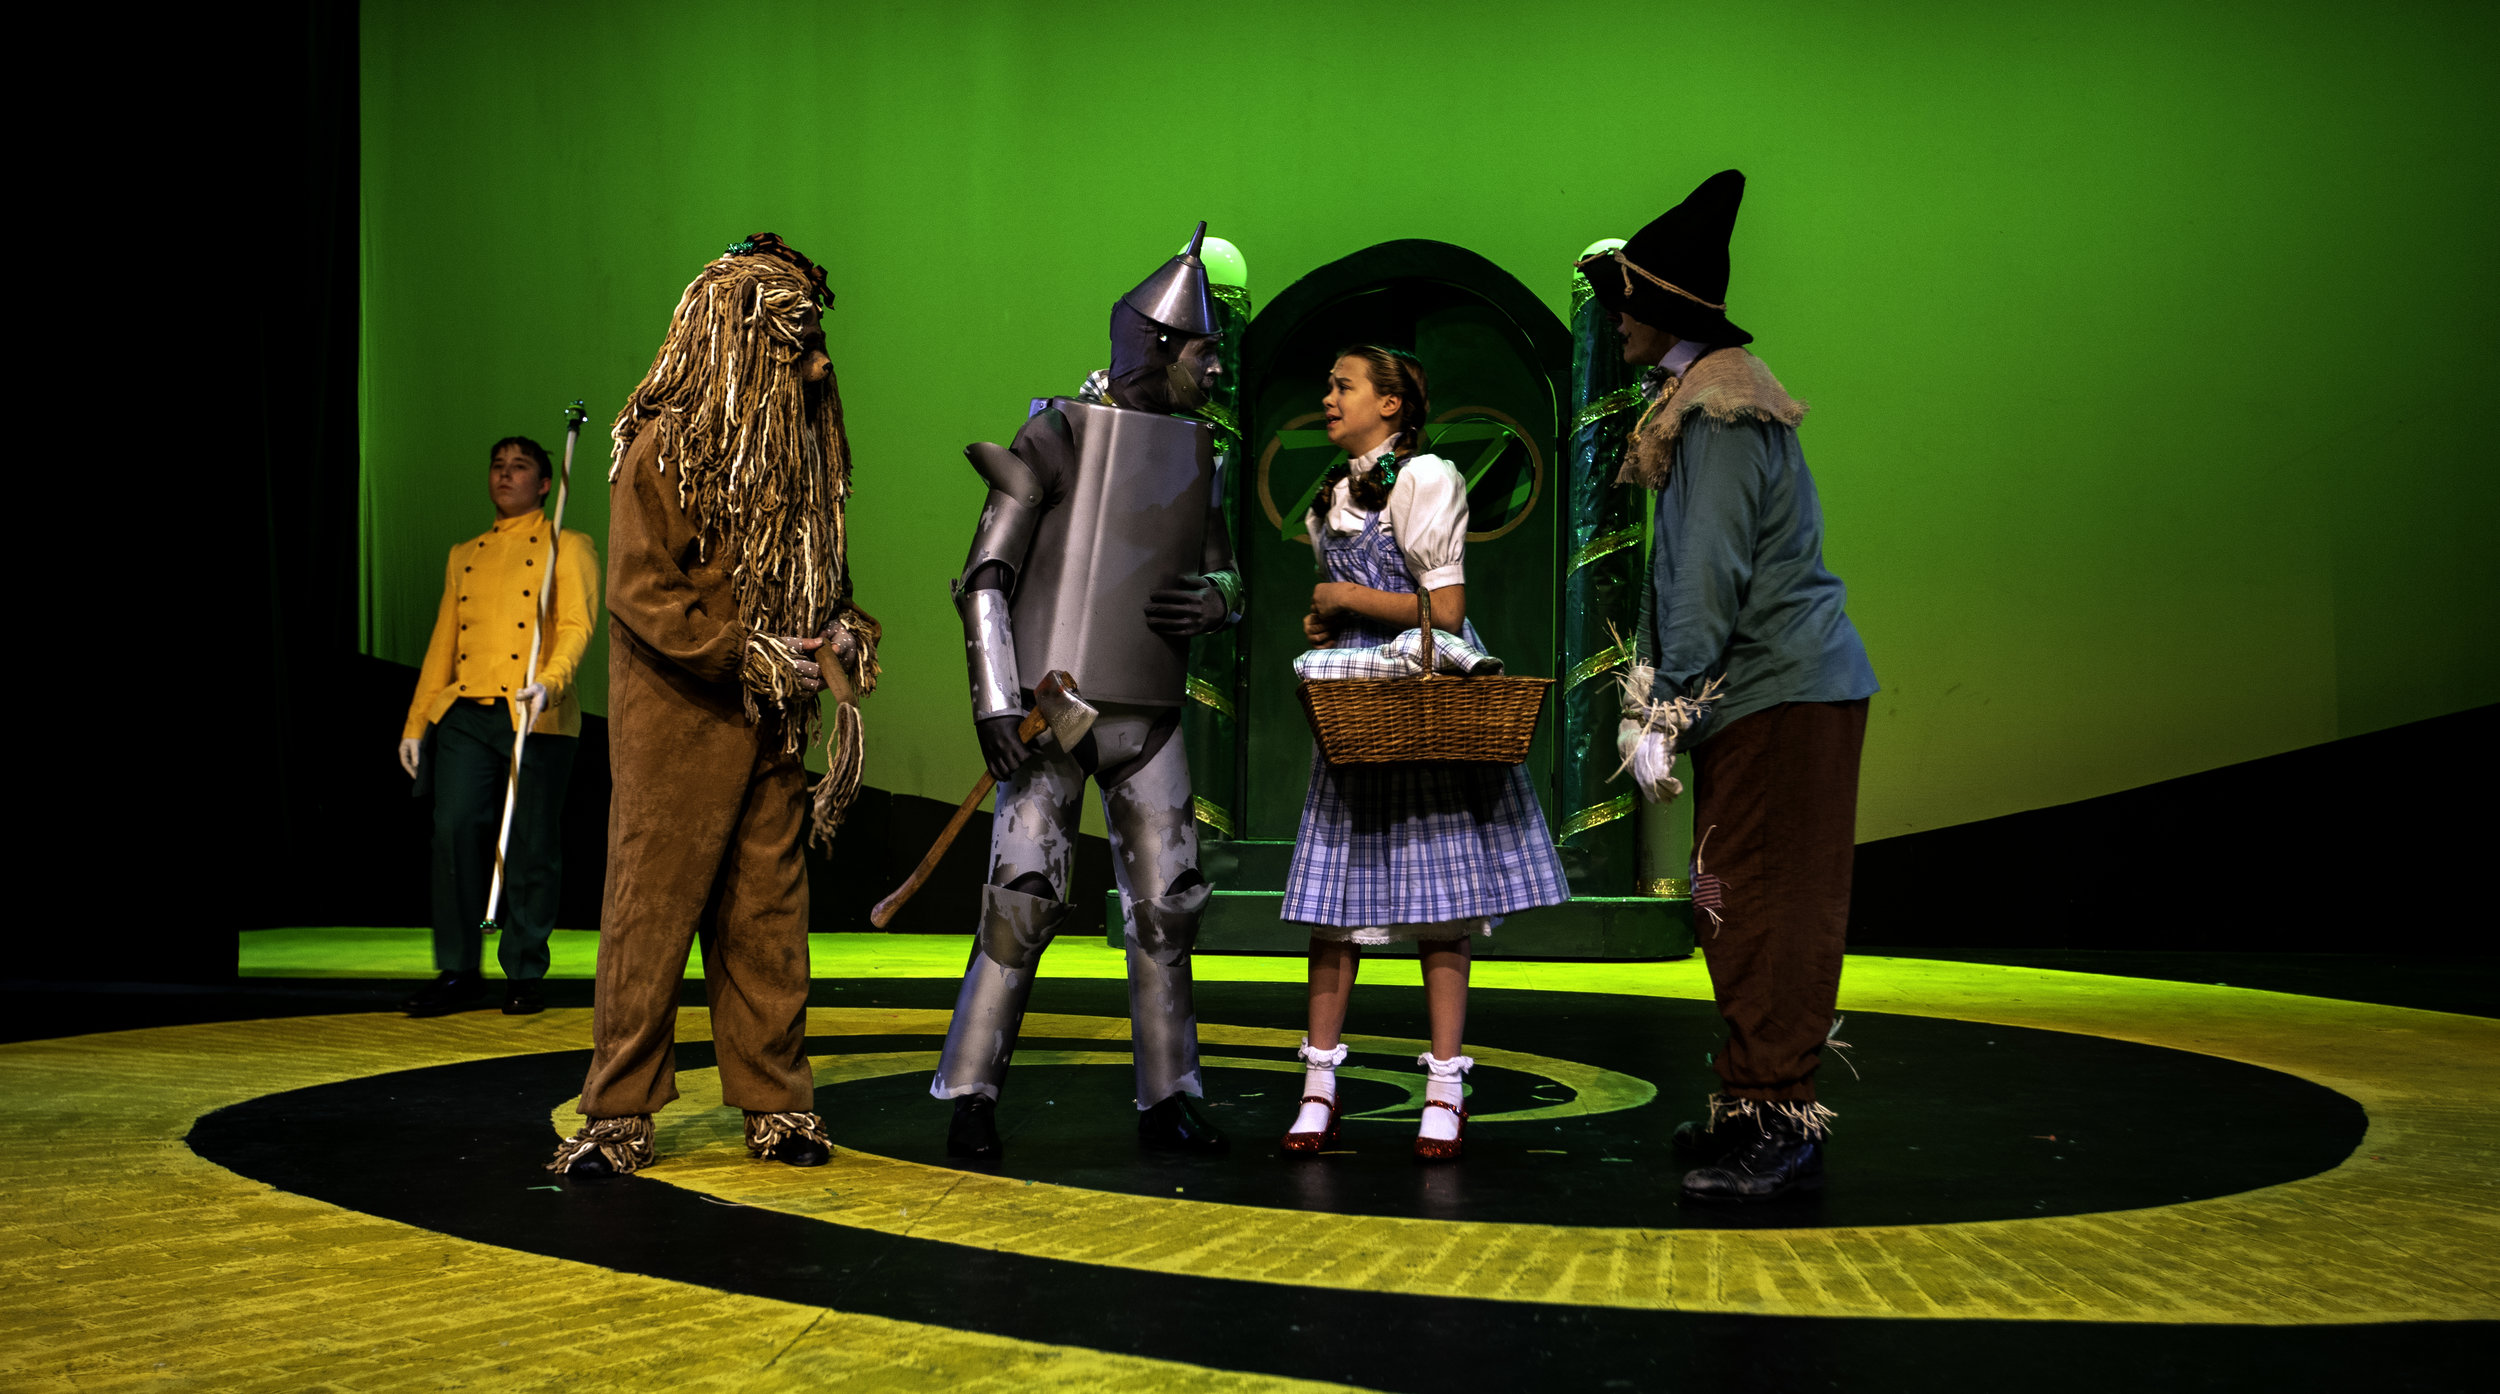 Dorothy_Friends_Oz_3196.jpg